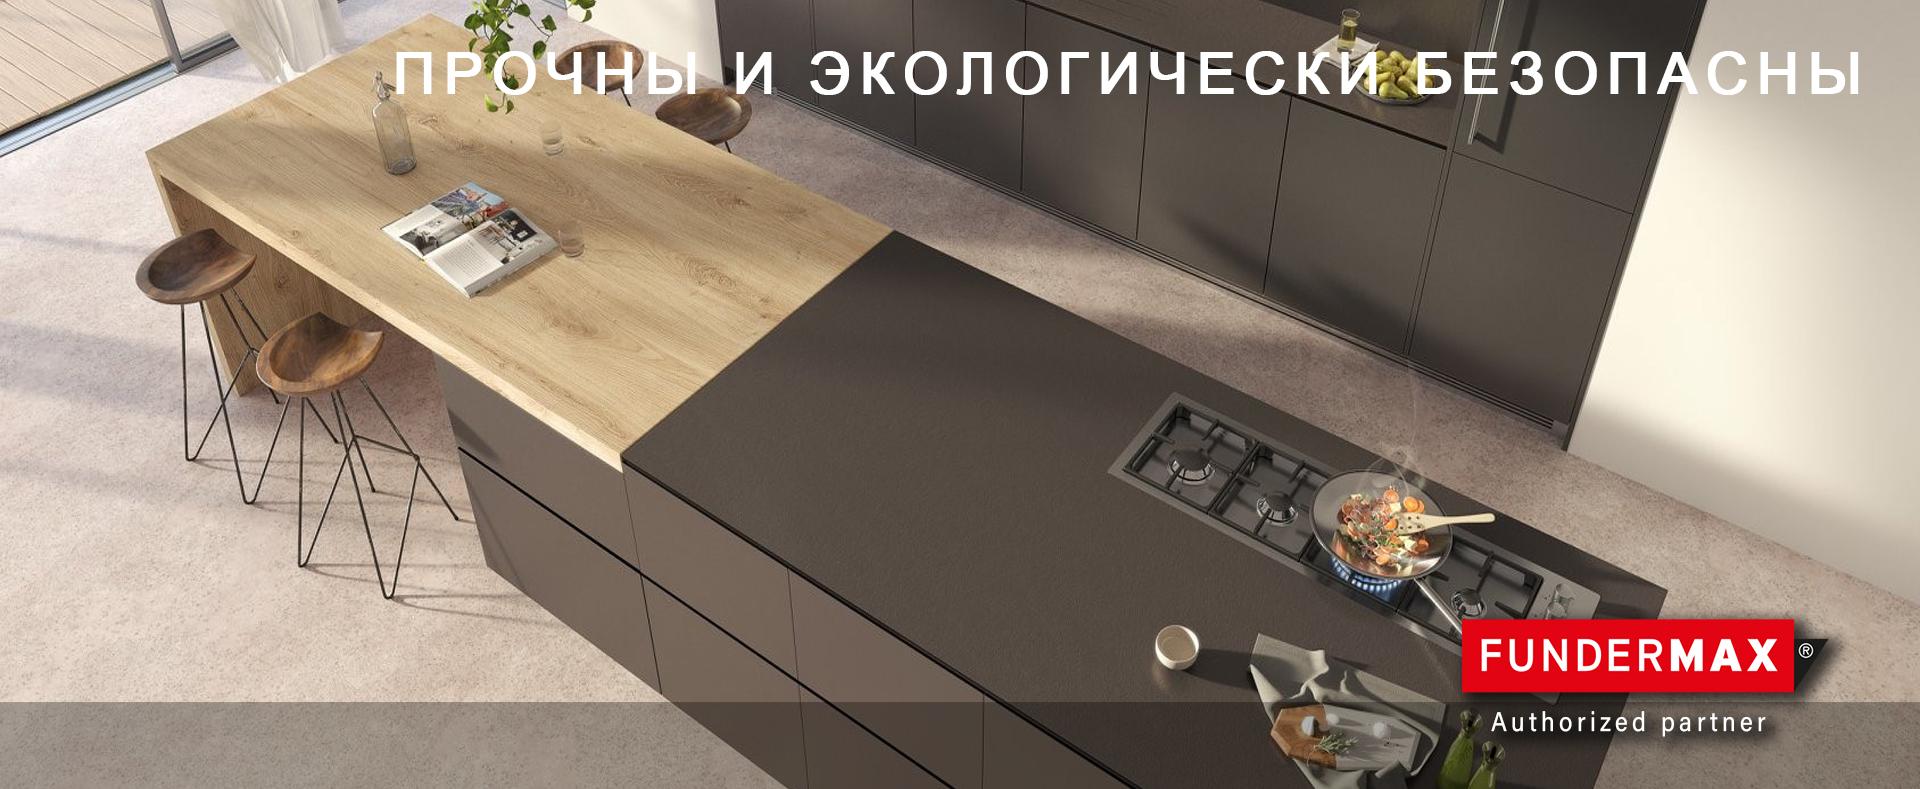 Елементы мебели